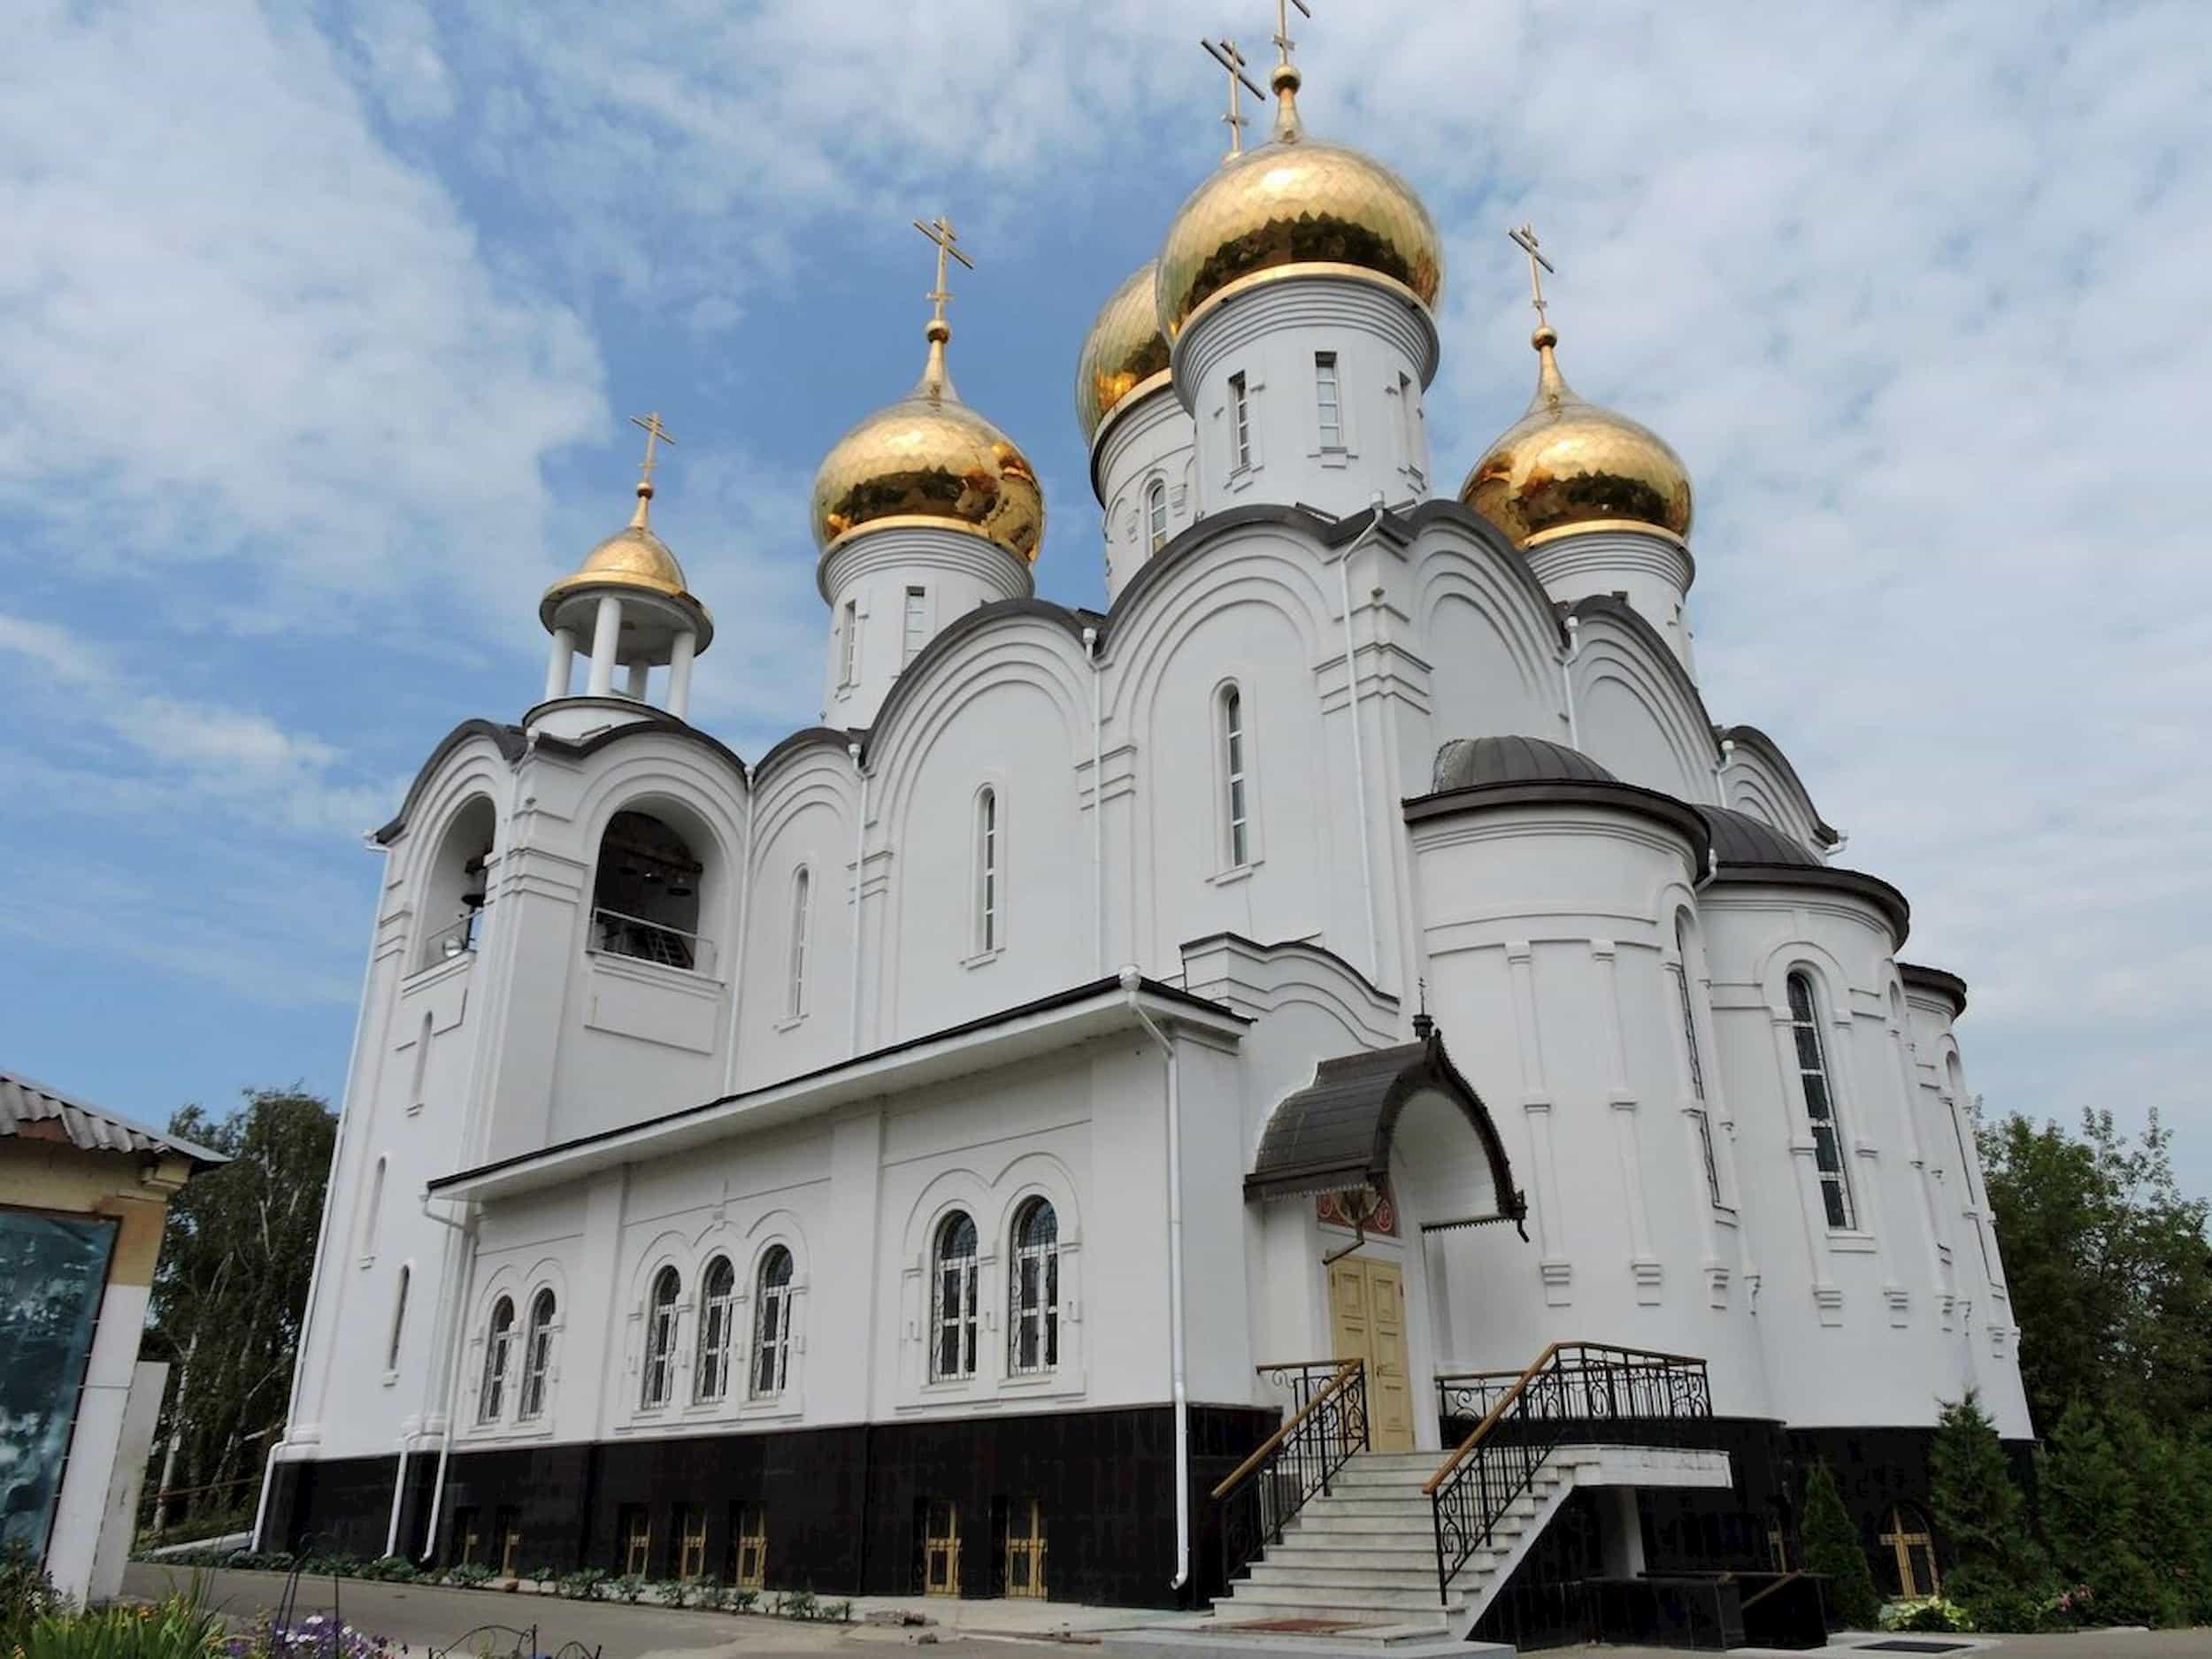 ritualnue-tovaru-zhukovskij